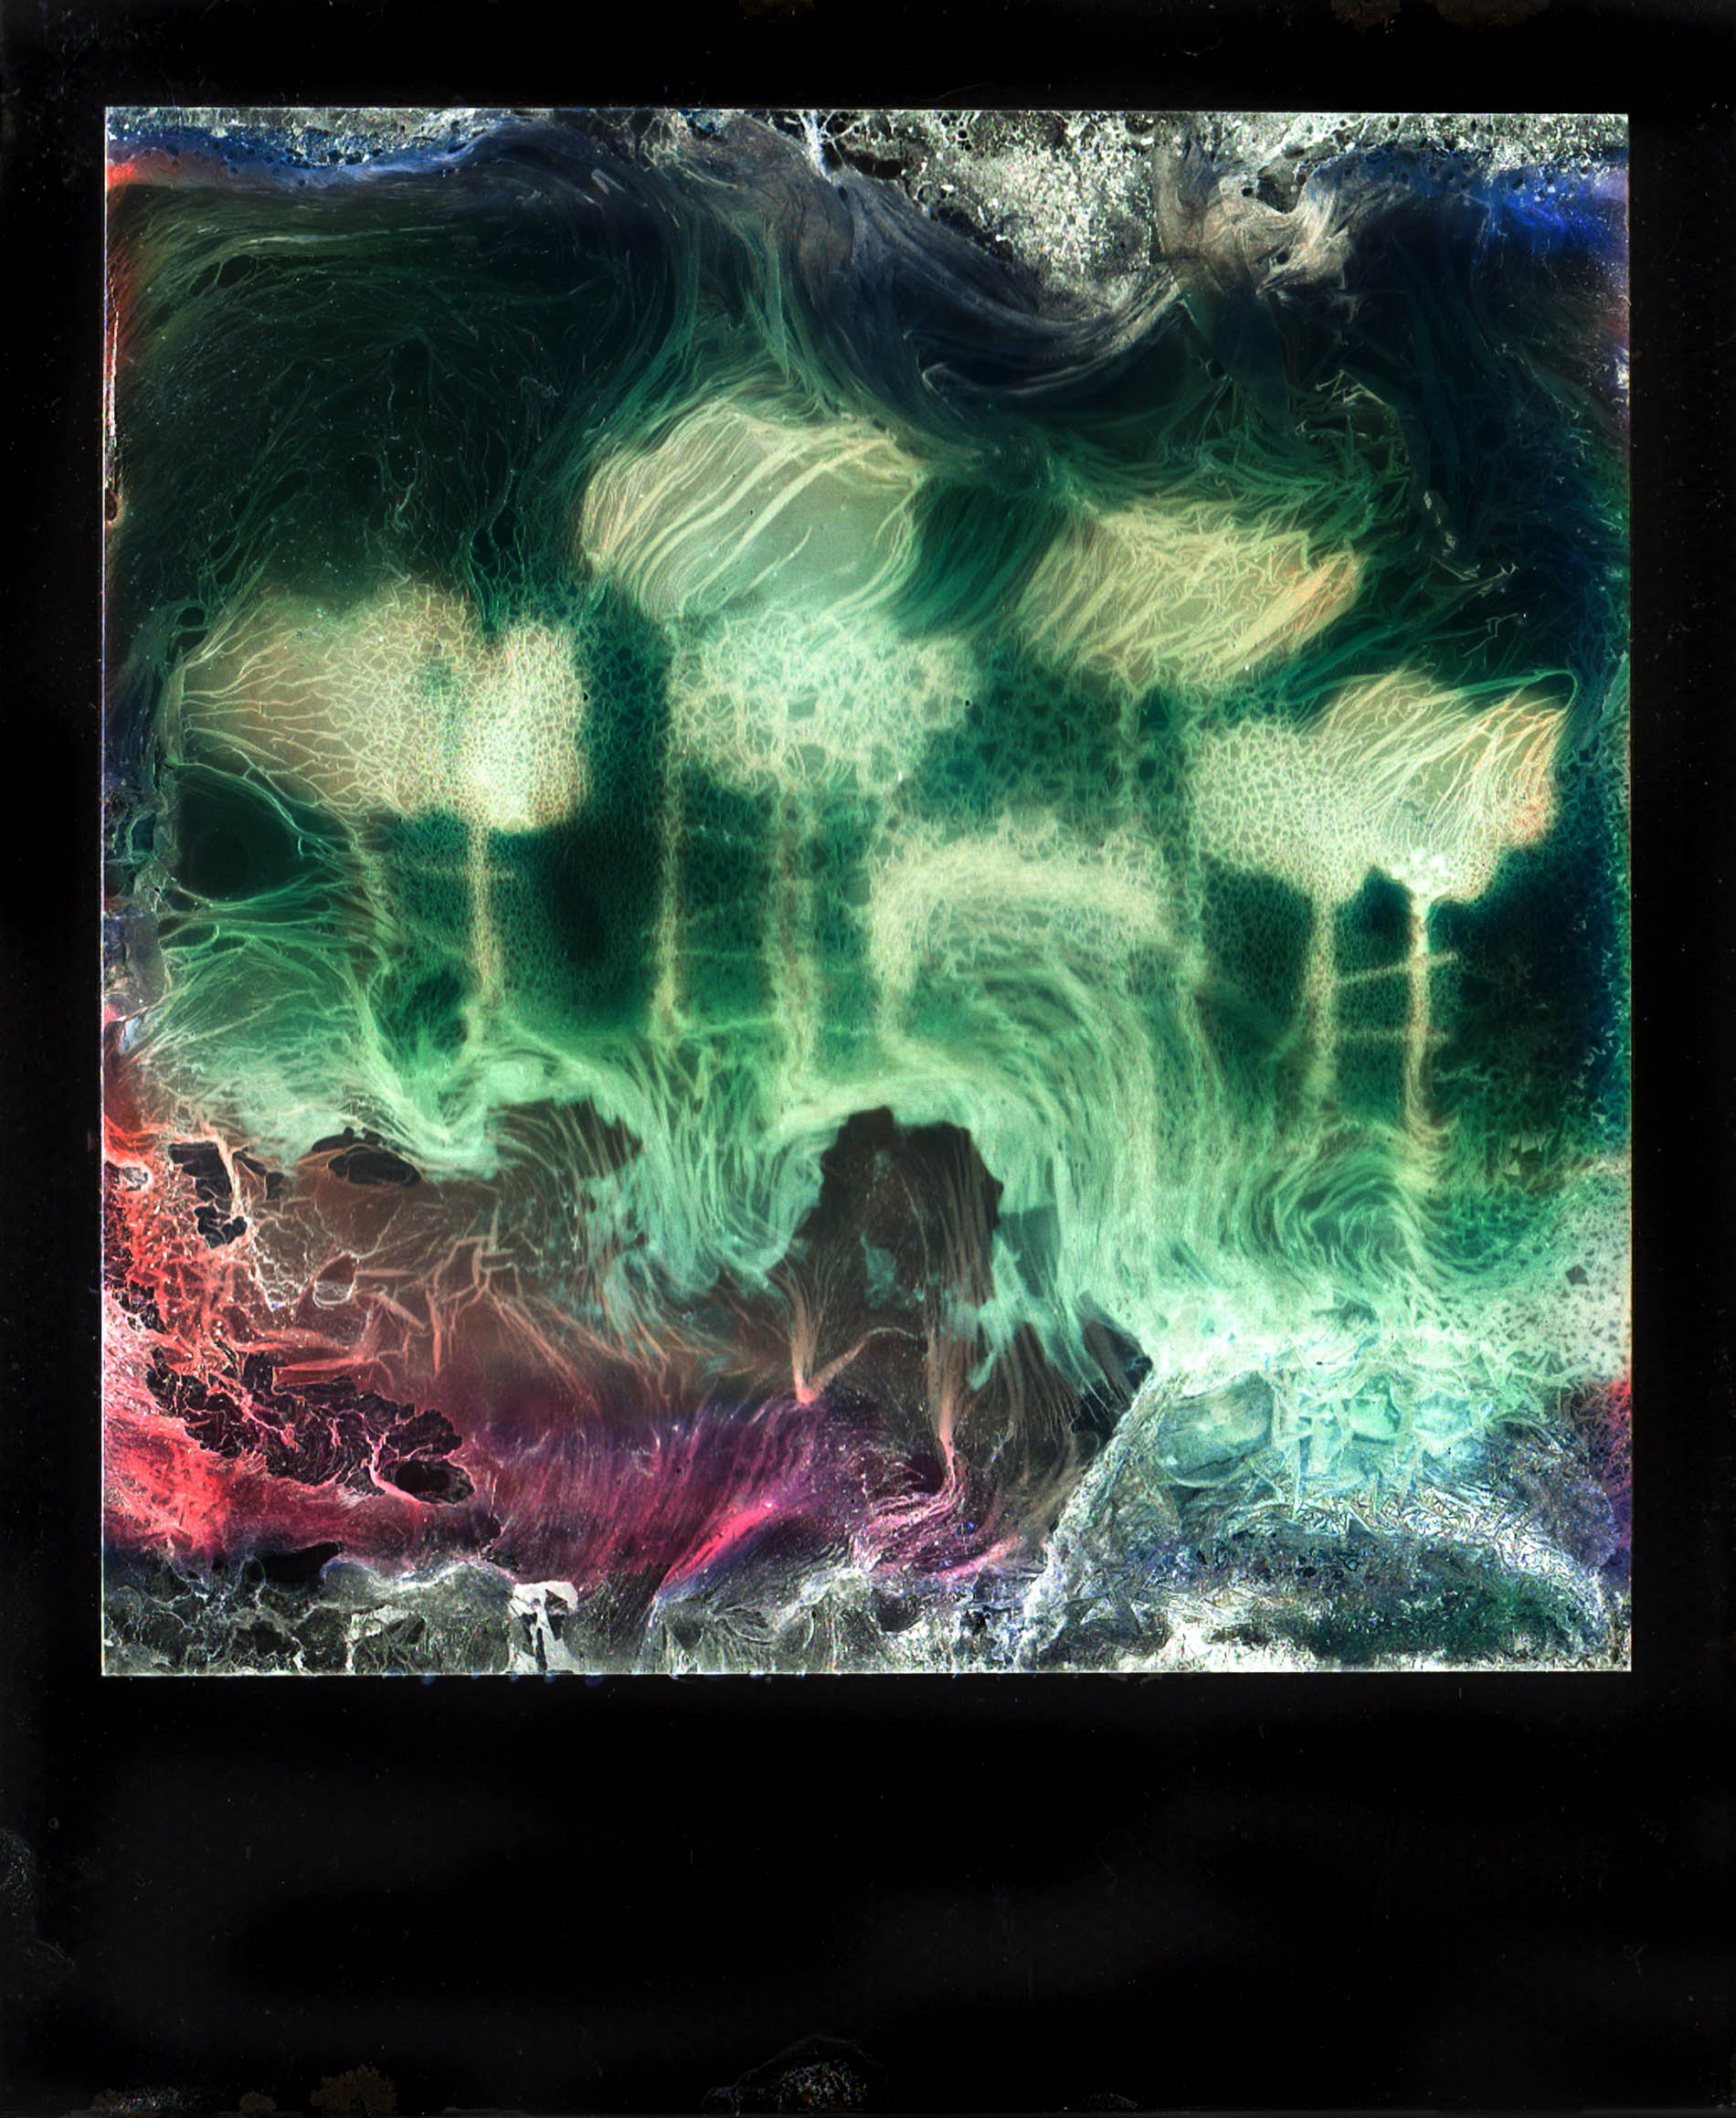 Submerged #2 Inverse